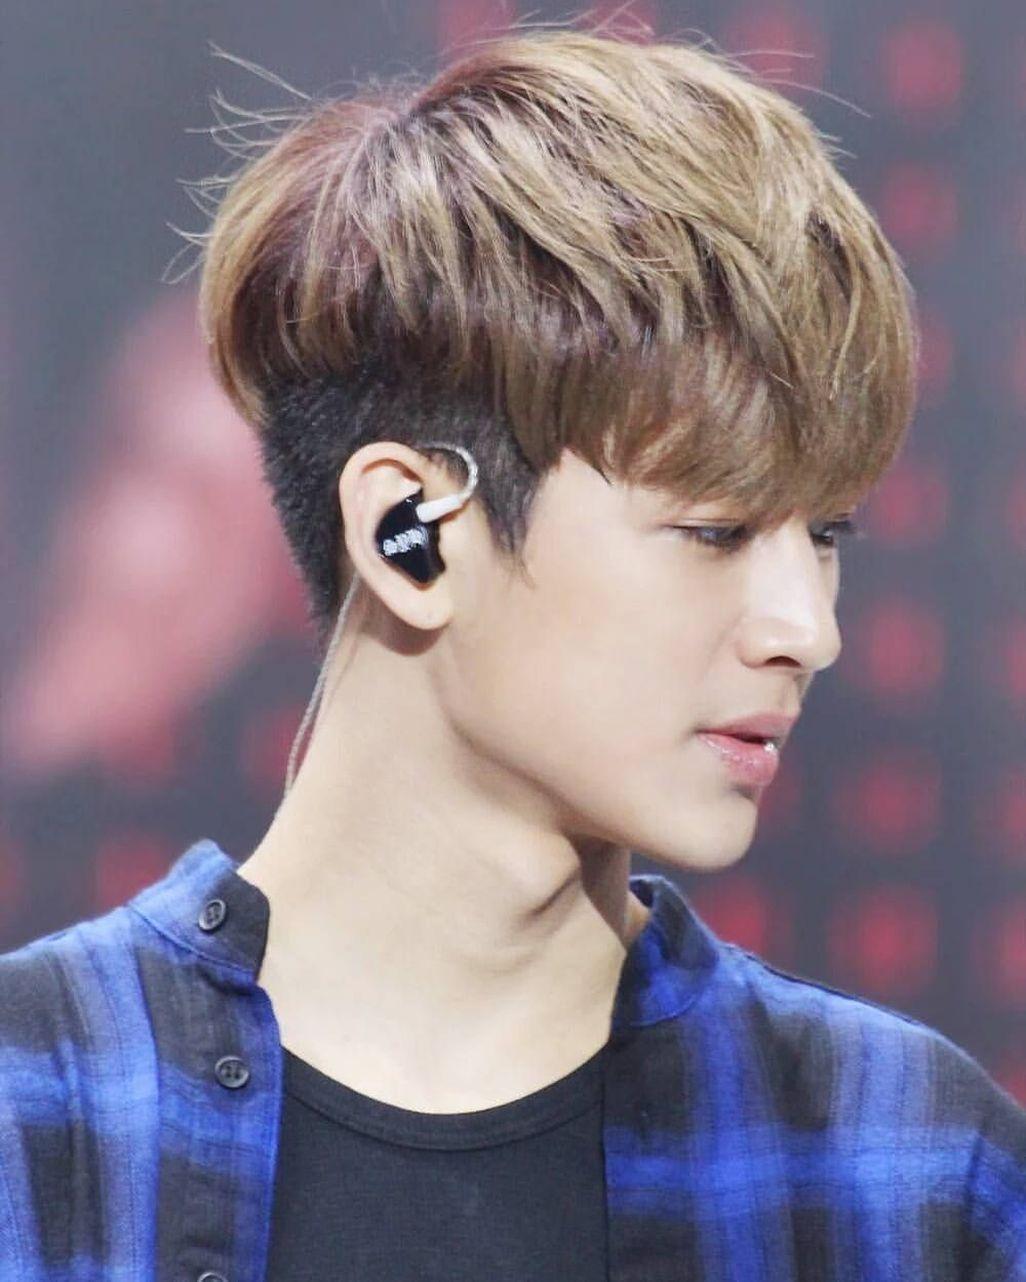 Cool 41 Most Popular Korean Hairstyle For Men More At Asiatische Frisuren Herren Manner Hairs Korean Men Hairstyle Asian Men Hairstyle Korean Hairstyle